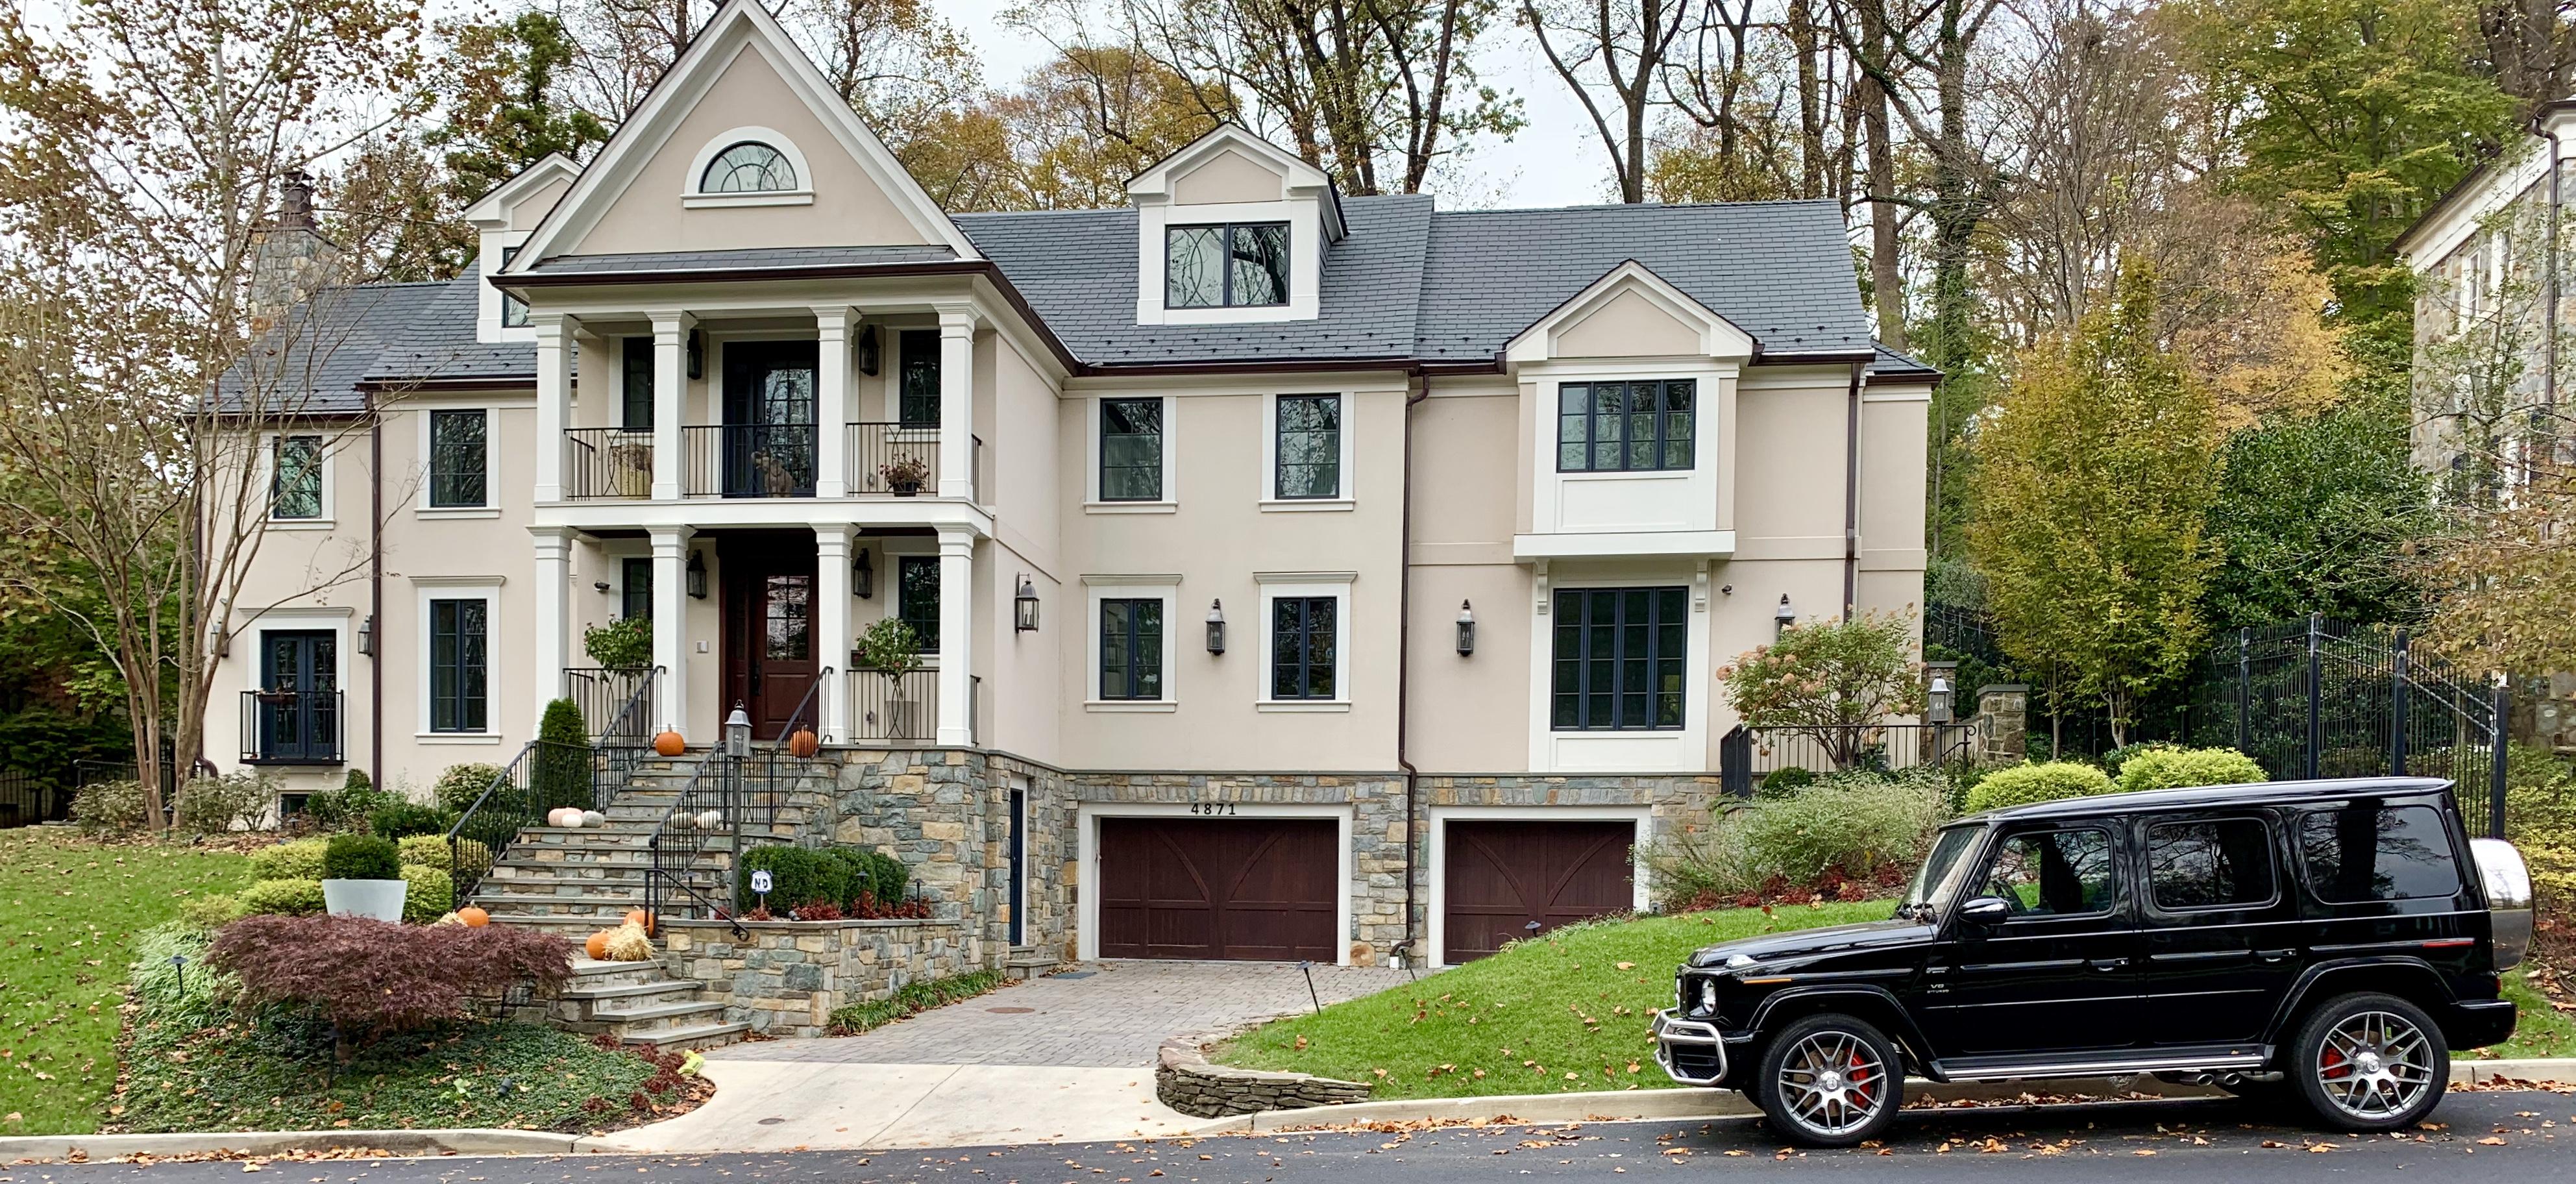 Craftsman Homes in Washington, DC. Glenbrook Road in Spring Valley